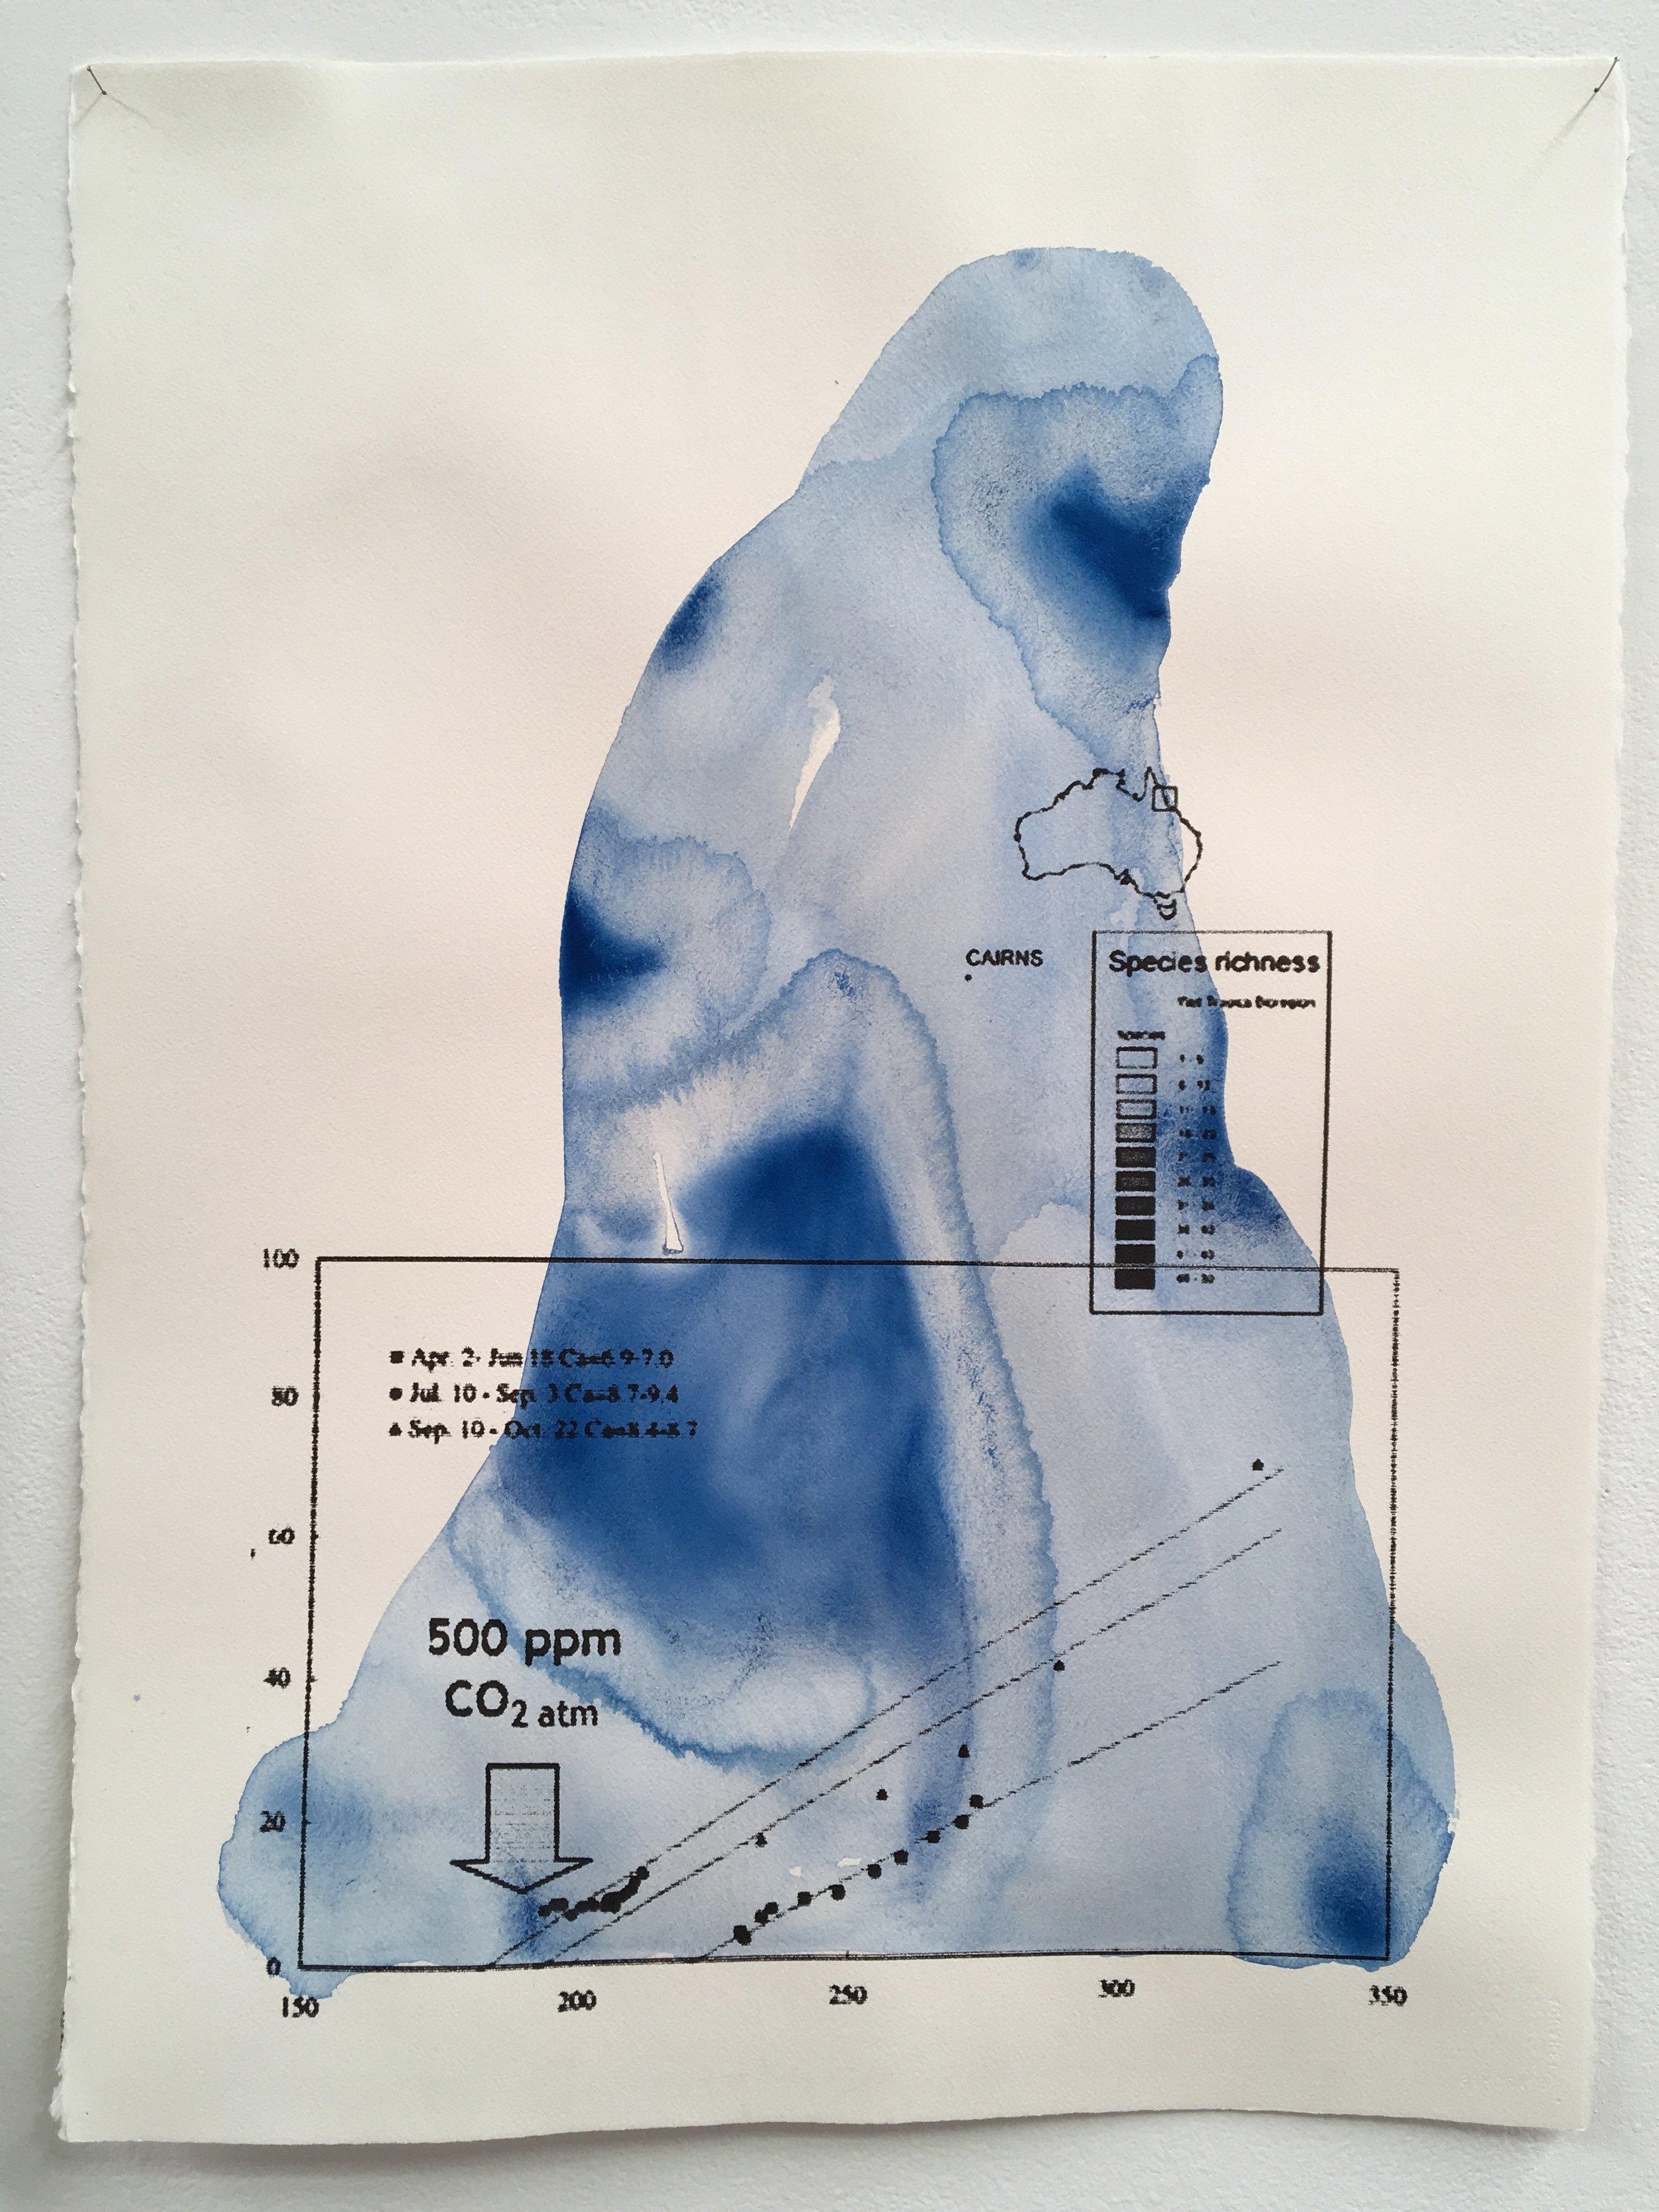 Judy Watson heron island 5 2009-16 acrylic and digital print on paper 77 x 57 cm.jpg